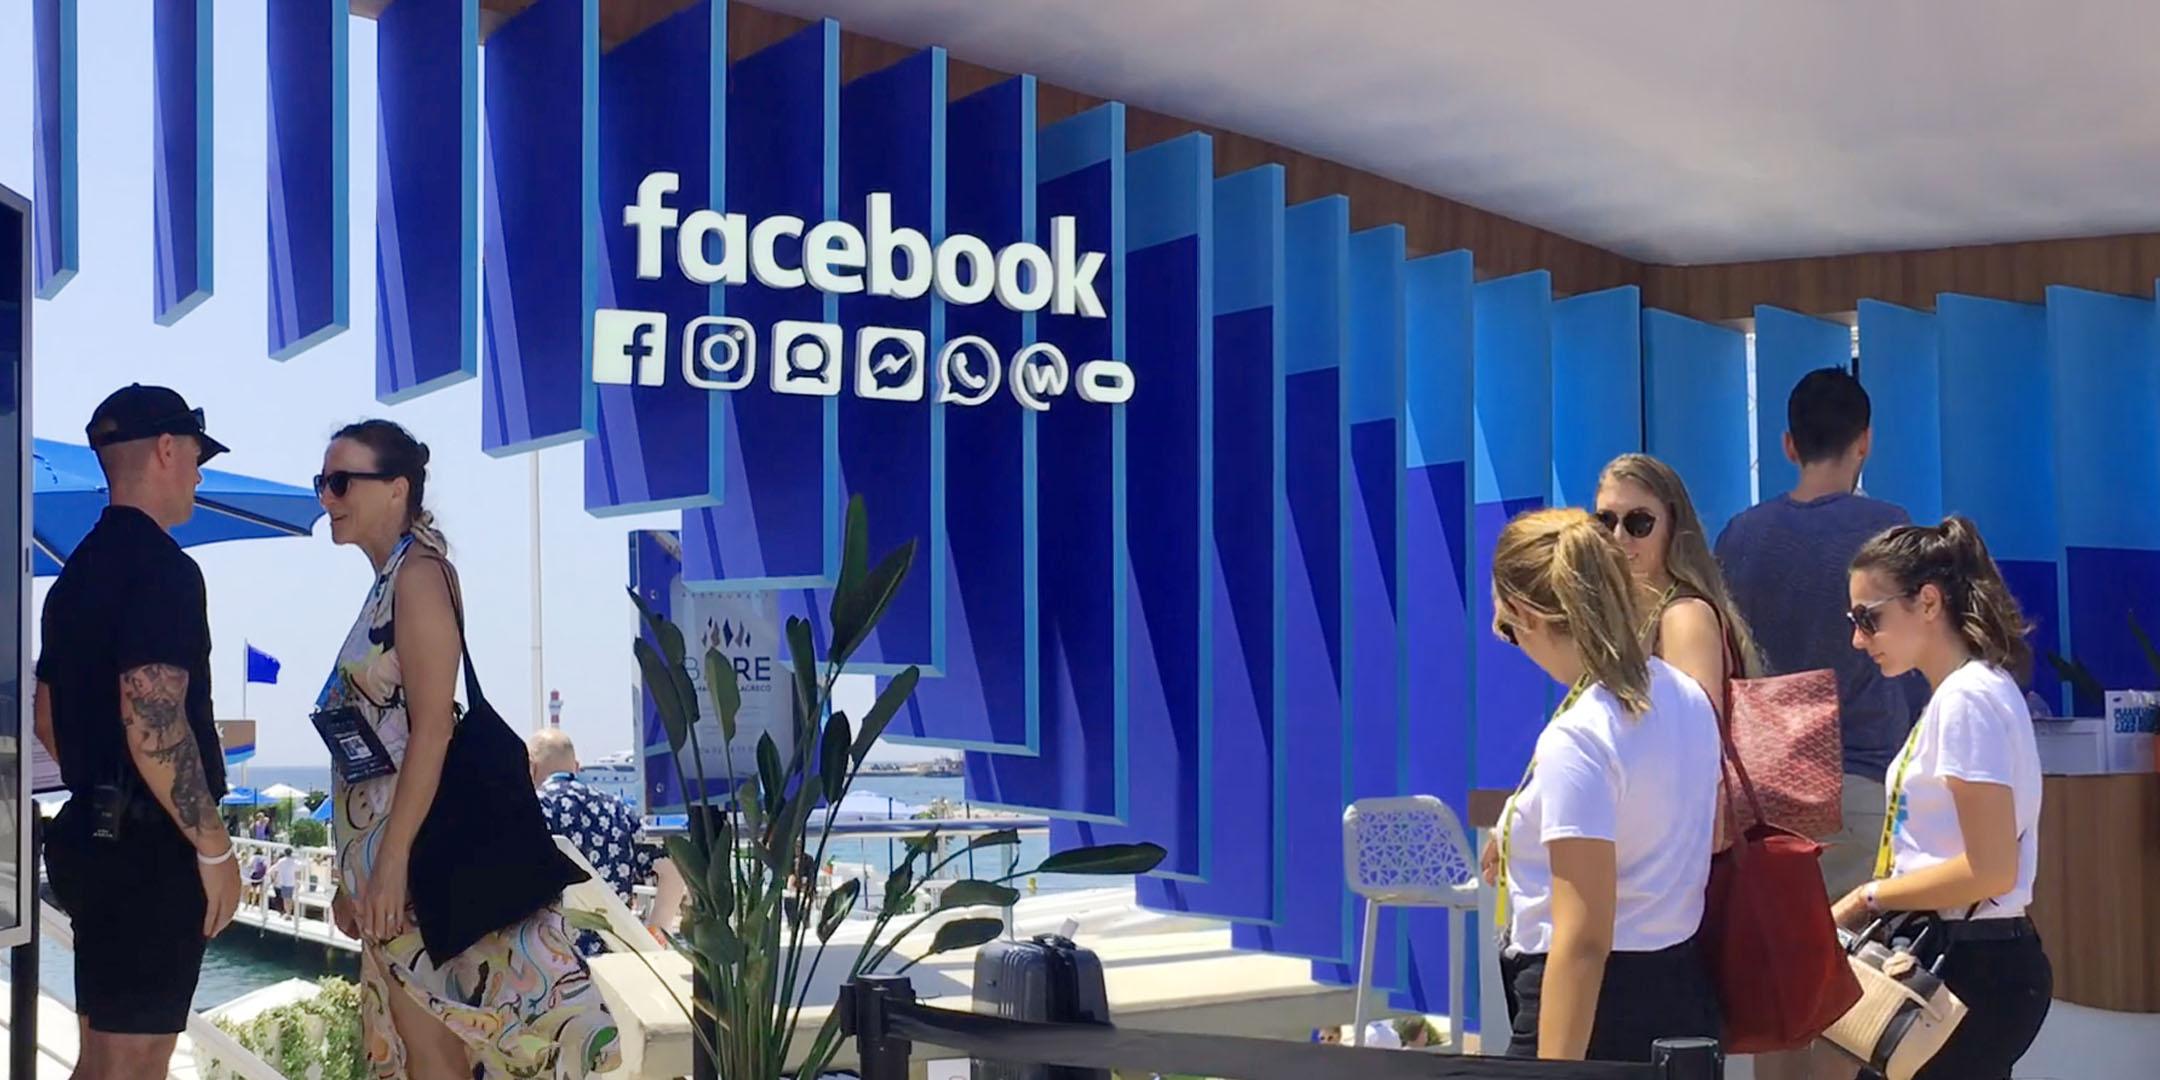 Facebook - Cannes Lions Festival Presence